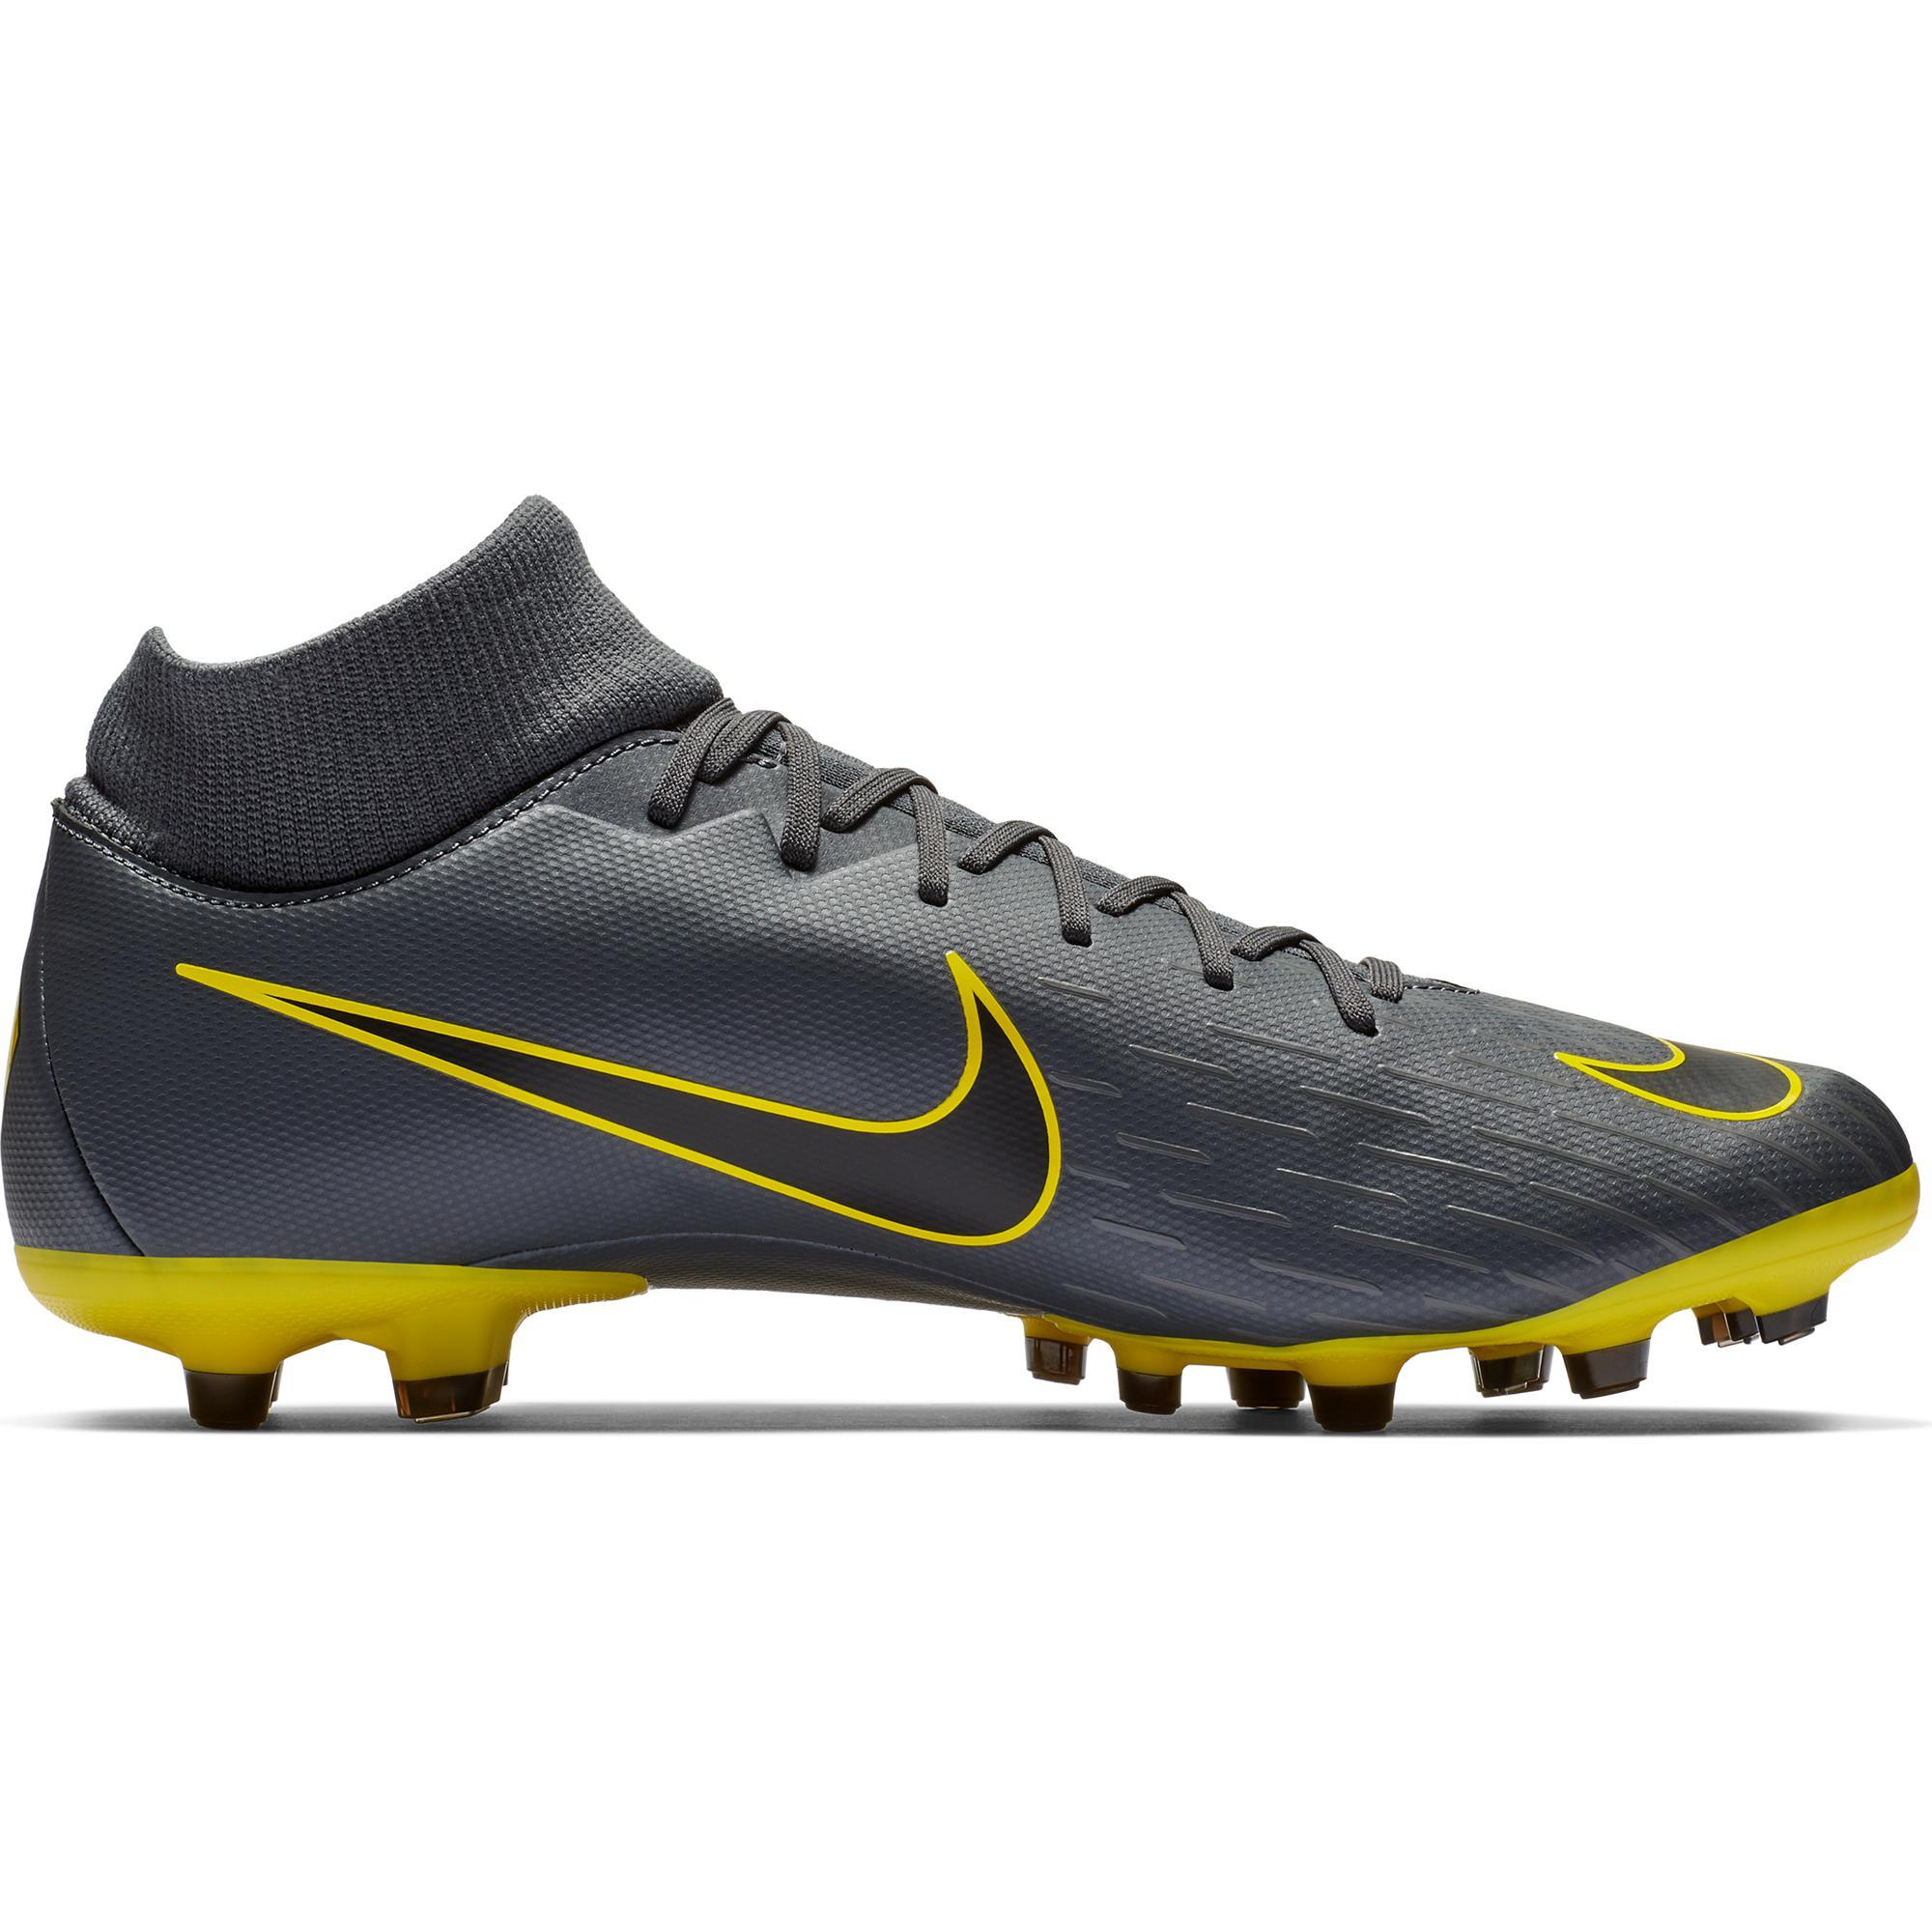 Fußballschuhe Superfly 6 Academy Mercurial MG Erwachsene | Schuhe > Sportschuhe > Fußballschuhe | Nike